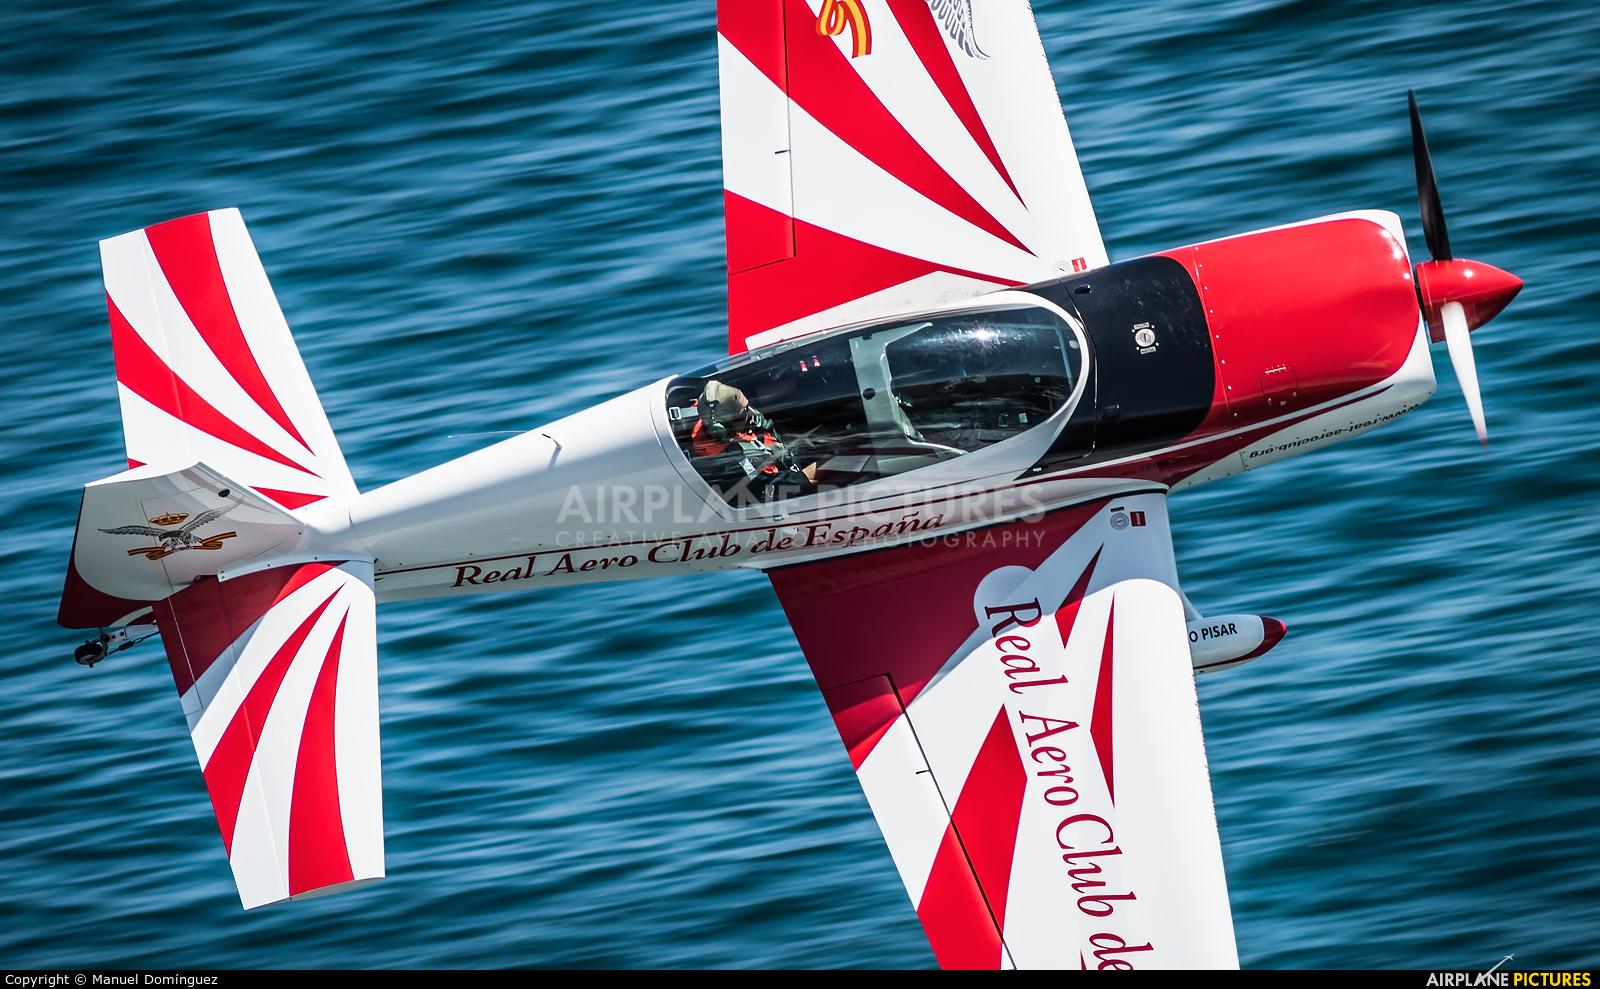 Real Aero Club de España EC-KFV aircraft at Off Airport - Spain